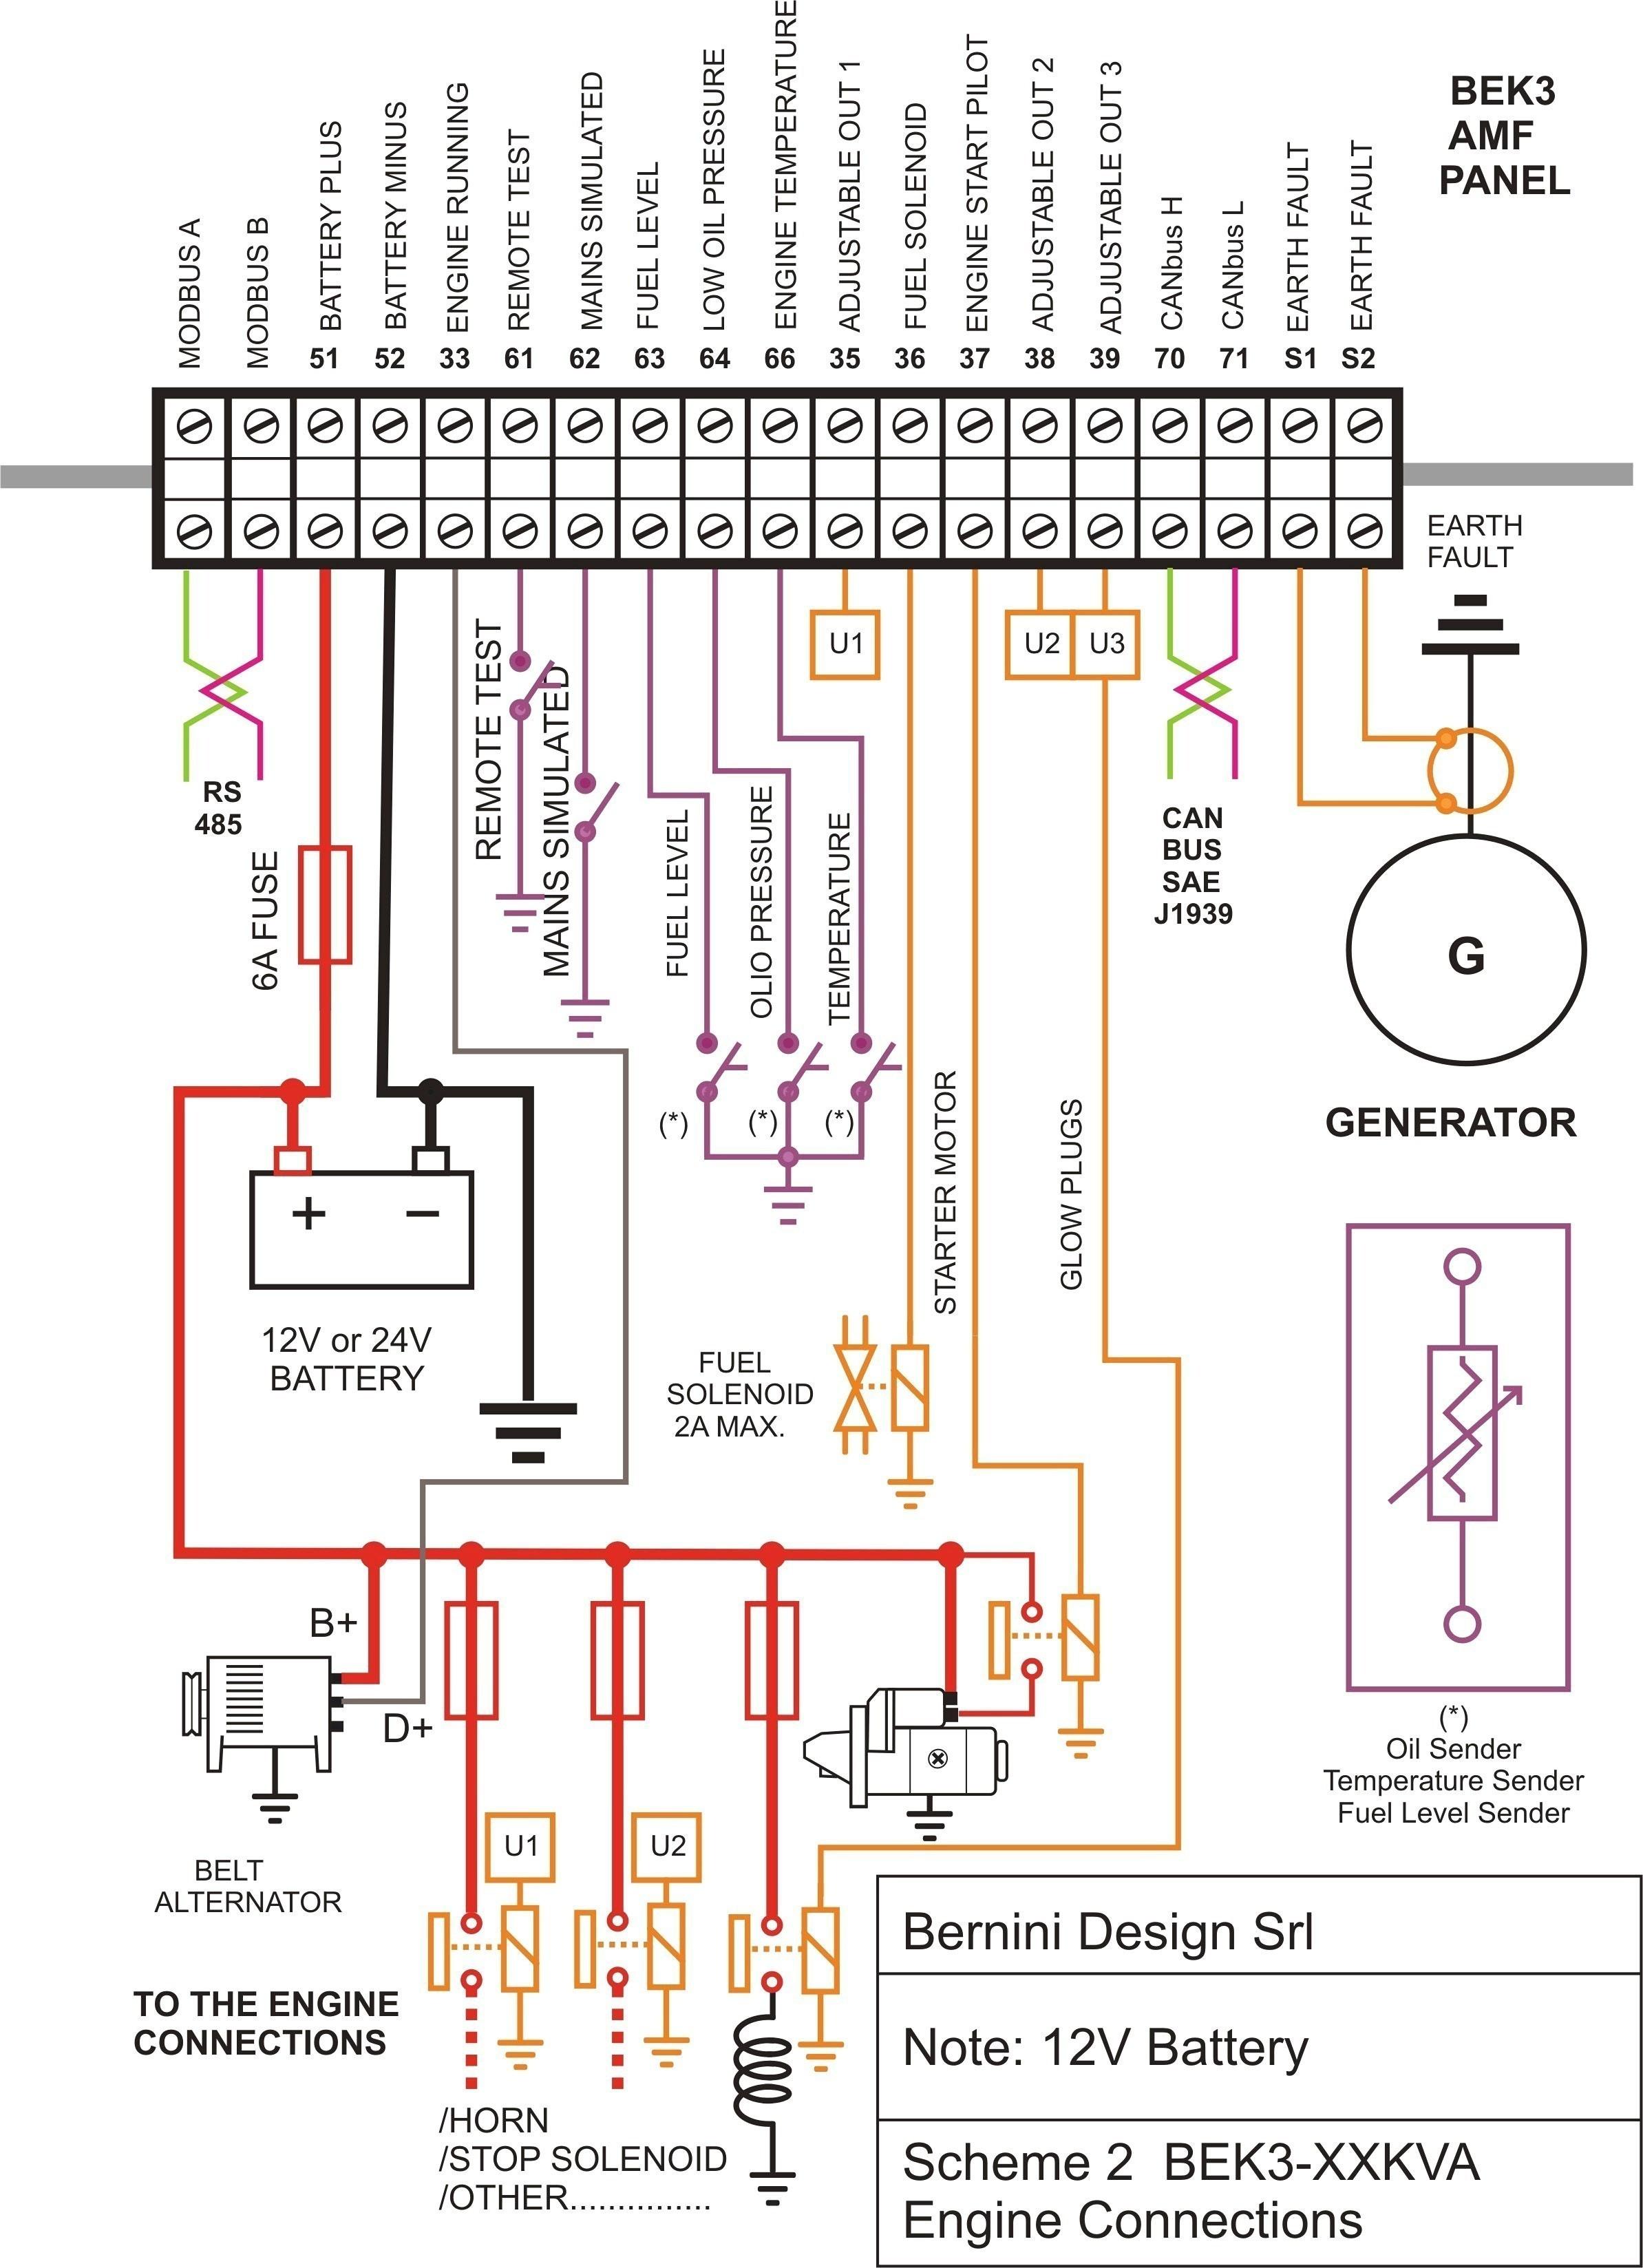 Wiring Diagram Software - Wiring Solution 2018 - Wiring Diagram Creator